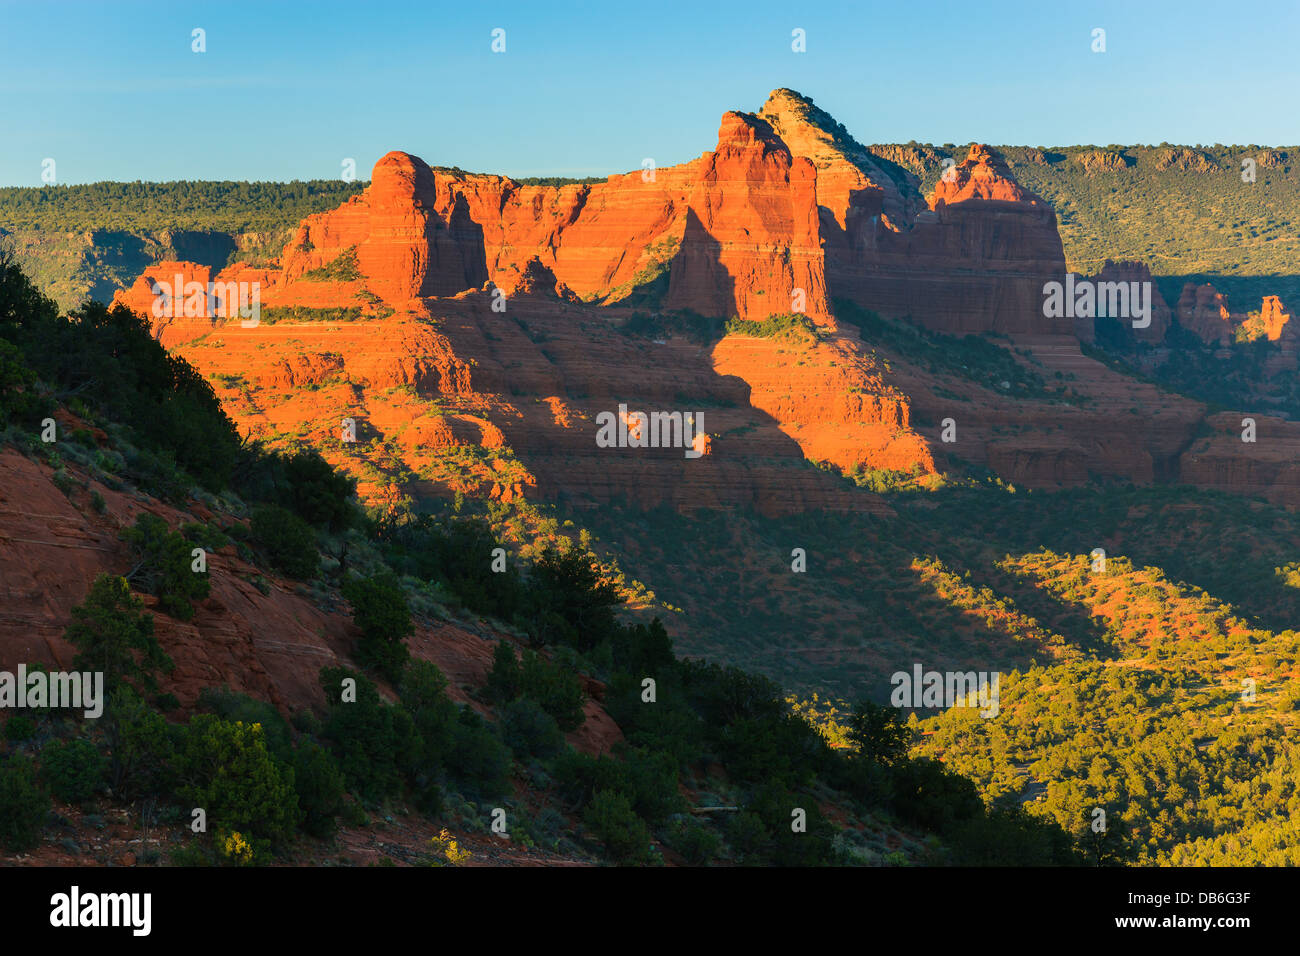 Rock formations just outside Sedona, Arizona - Stock Image